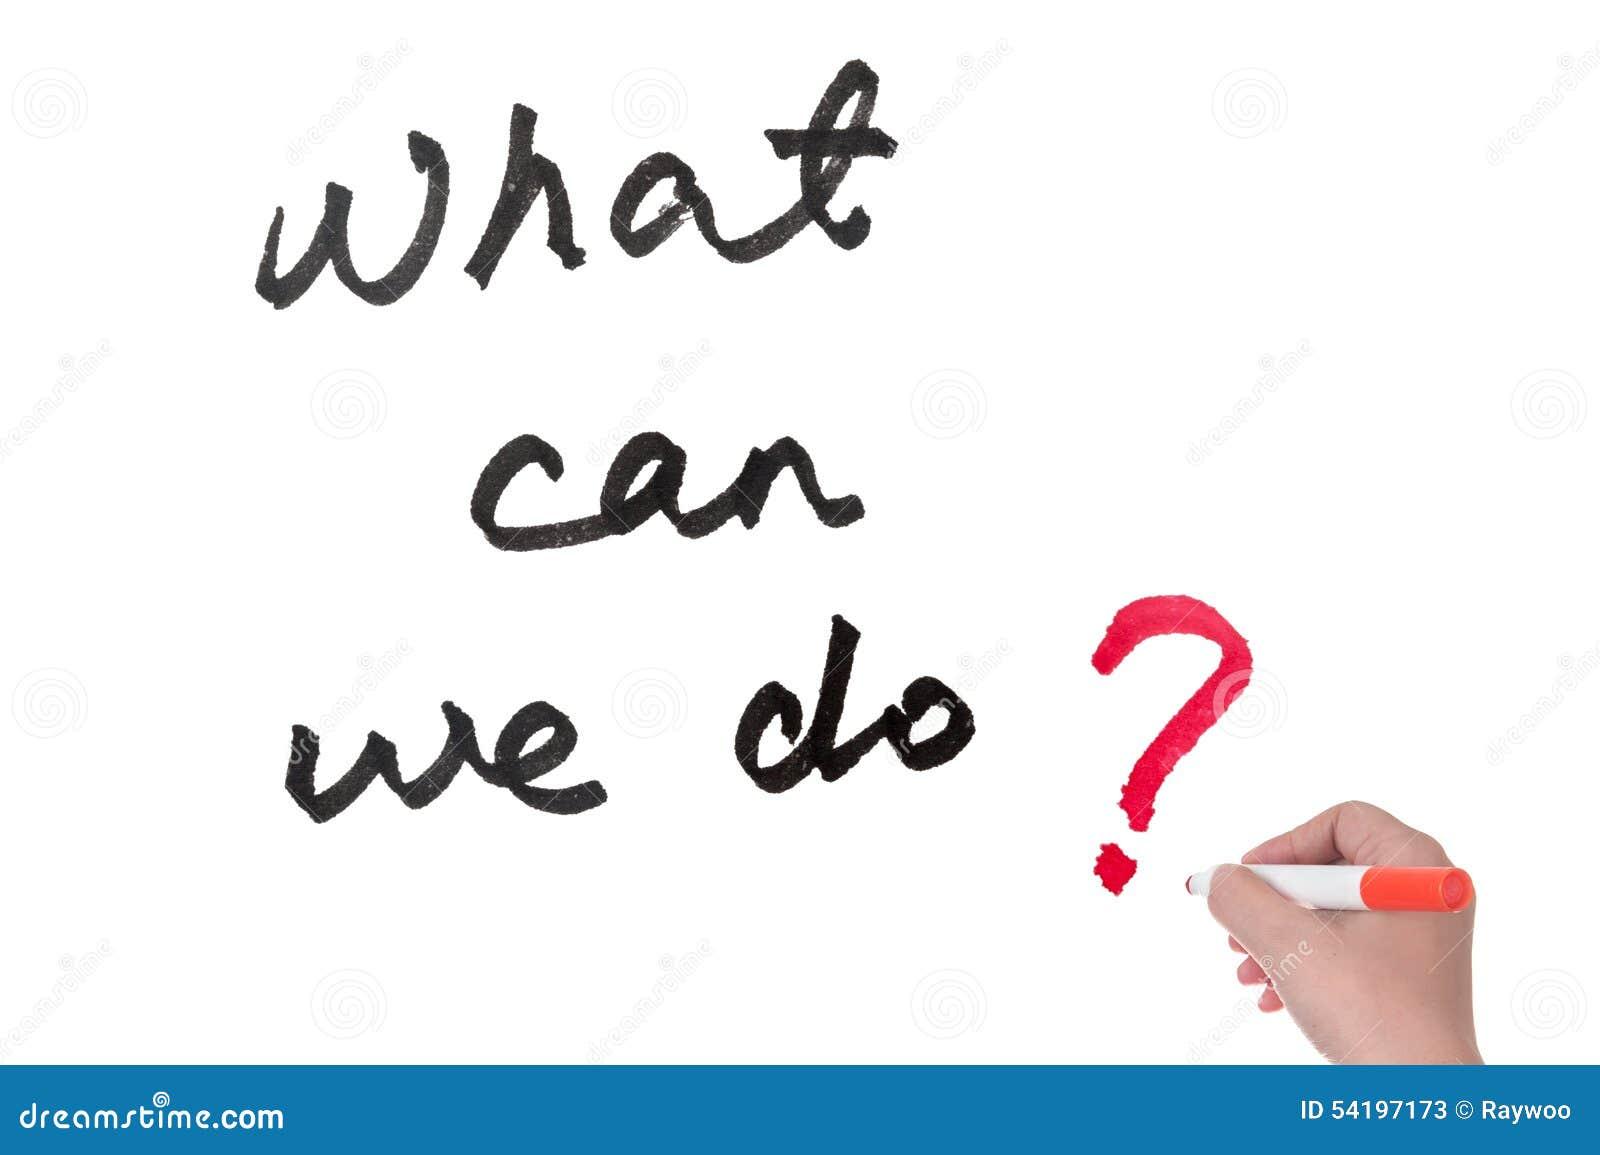 6dc420ee29 Τι μπορούμε να κάνουμε  στοκ εικόνα. εικόνα από επικοινωνία - 54197173